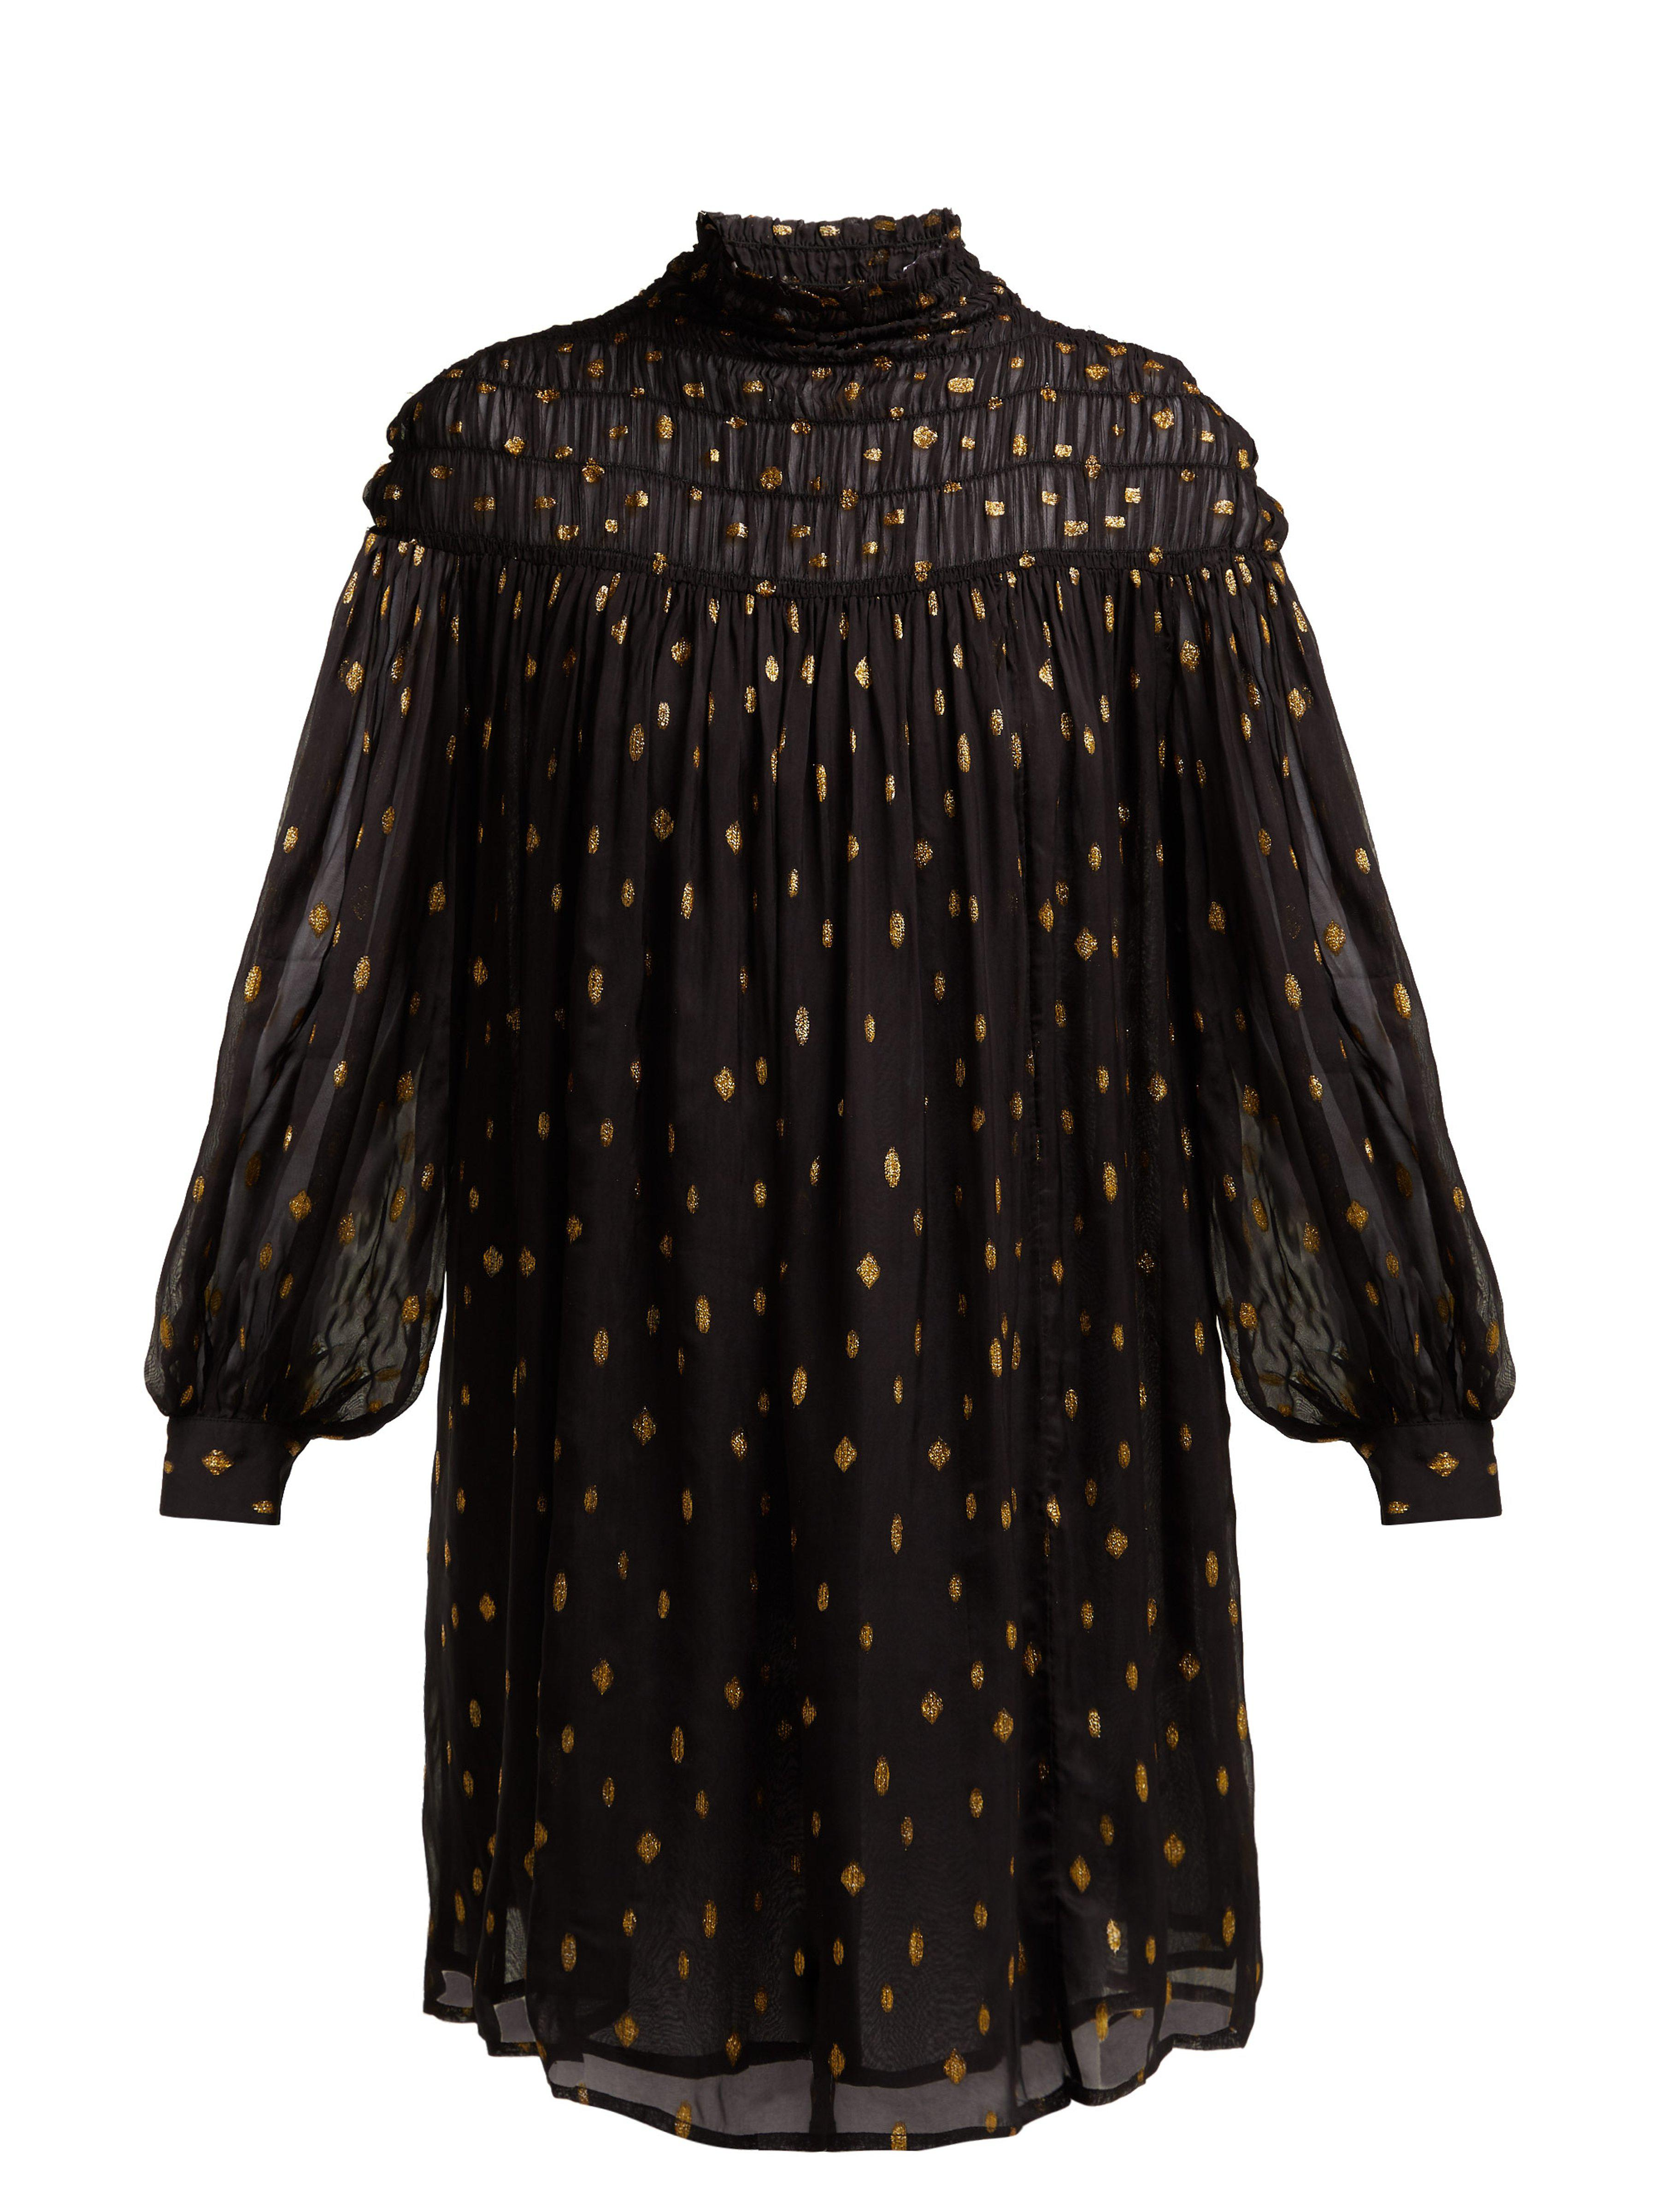 5159aa9c4e9b27 FRAME Smocked Polka Dot Fil Coupé Mini Dress in Black - Lyst